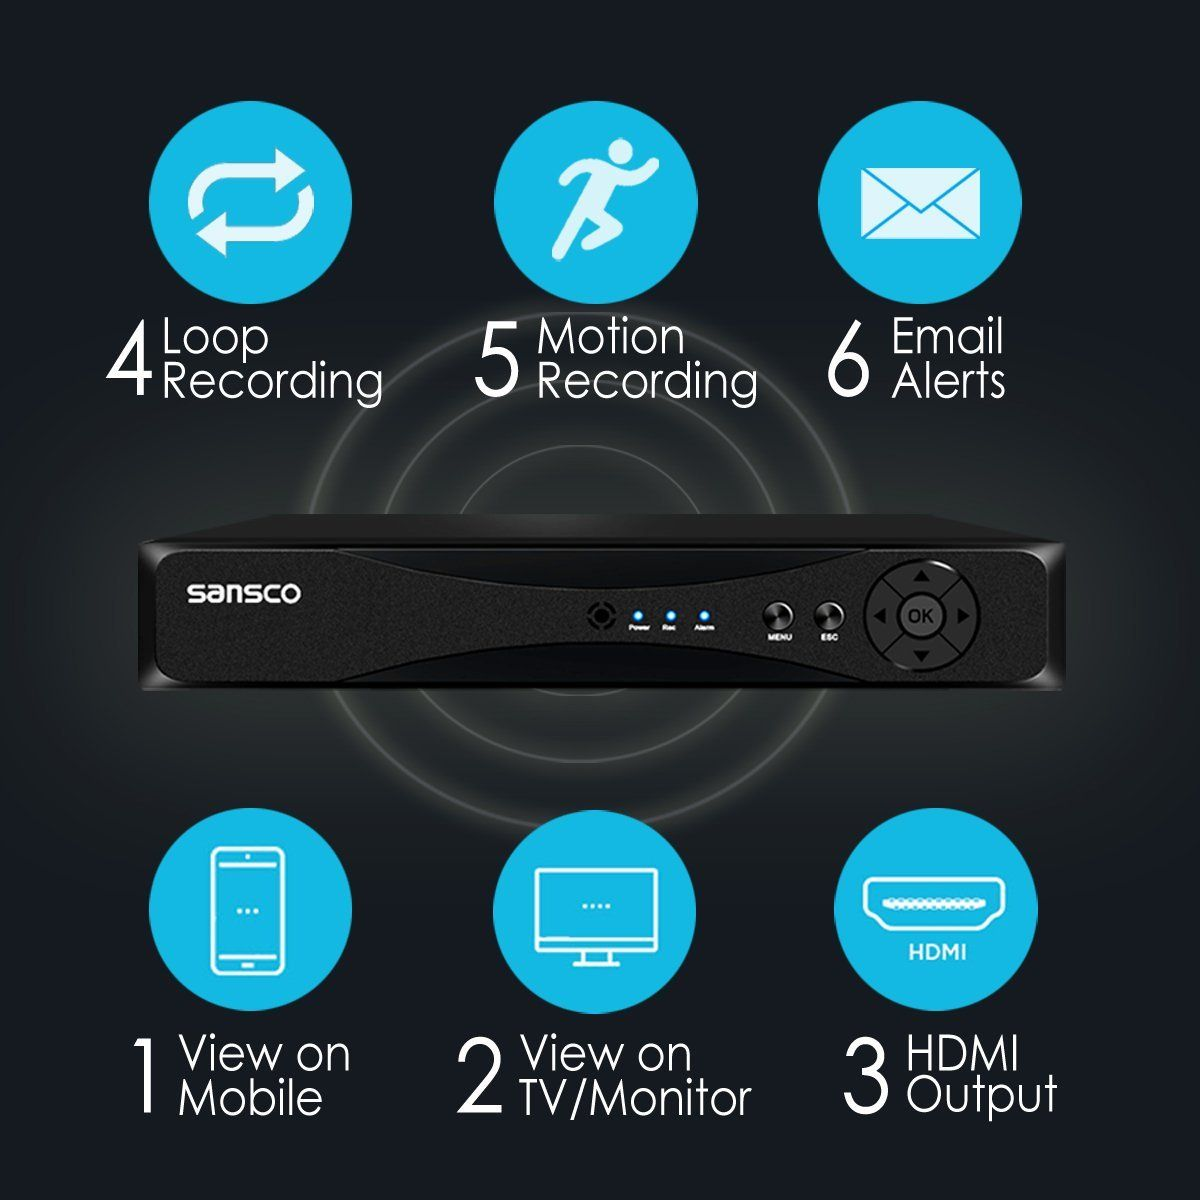 sansco s4d4c1t all in one smart cctv camera system pro. Black Bedroom Furniture Sets. Home Design Ideas